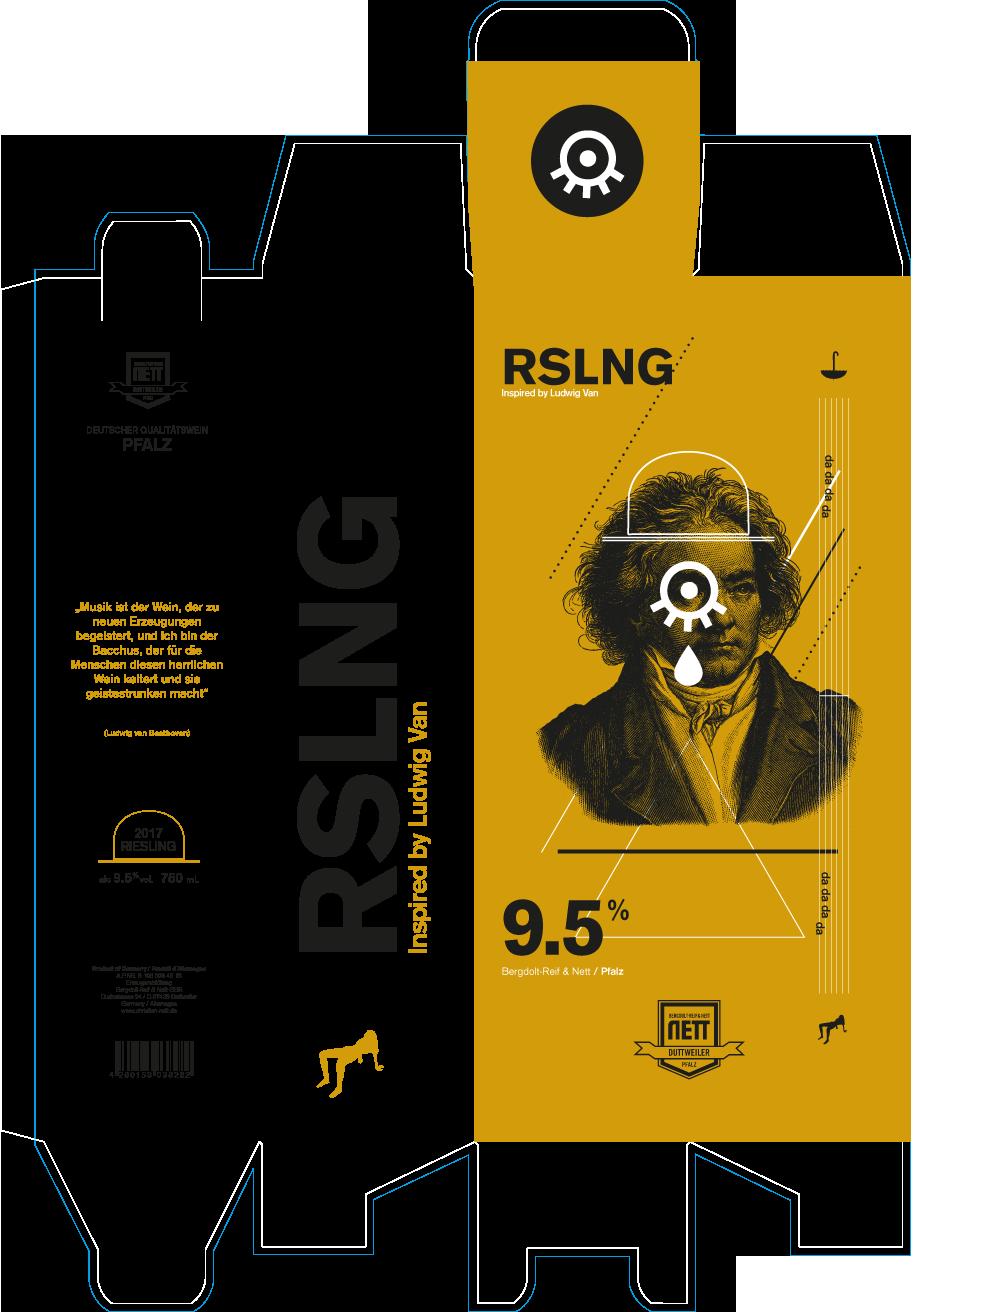 soheyl nassary RSLNG